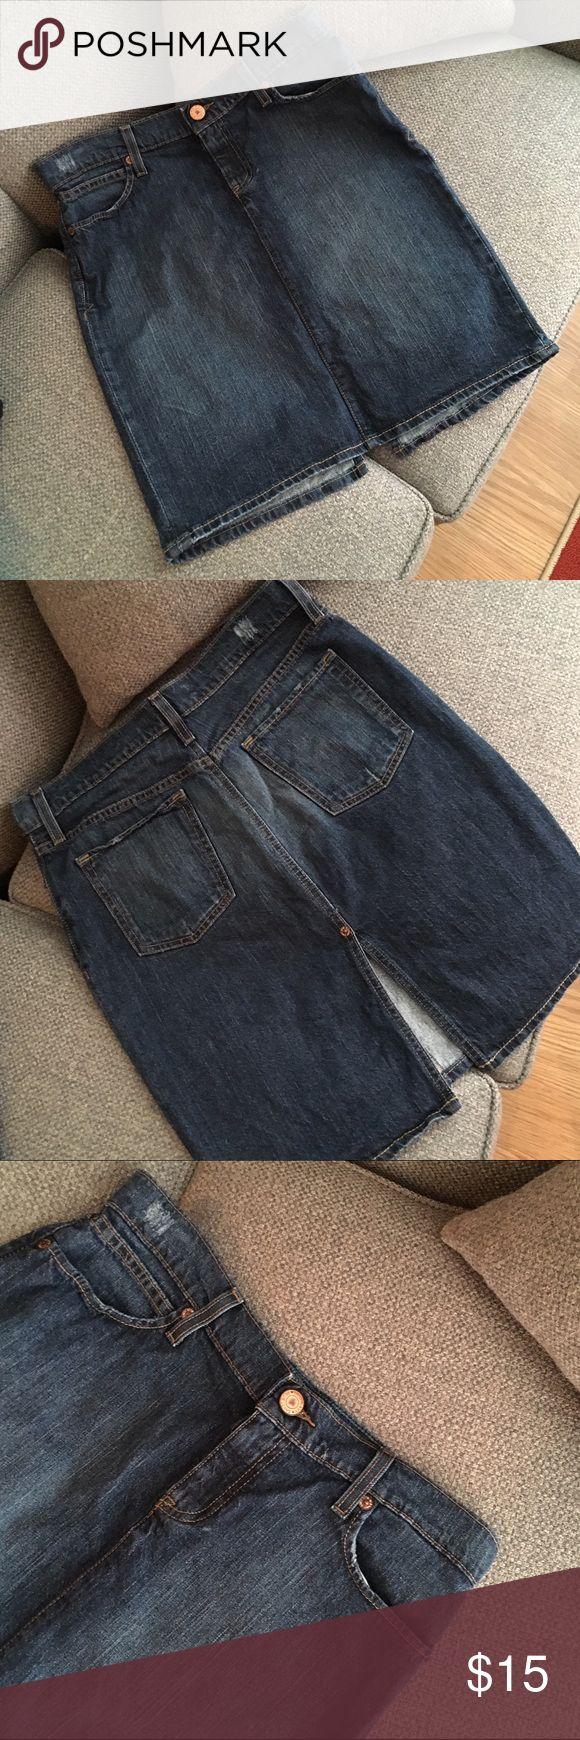 Jean Skirt Old Navy jean skirt. Size 8. Distressed dark denim/details. Back slit. 99% cotton/1% Lycra. Very good condition. Old Navy Skirts